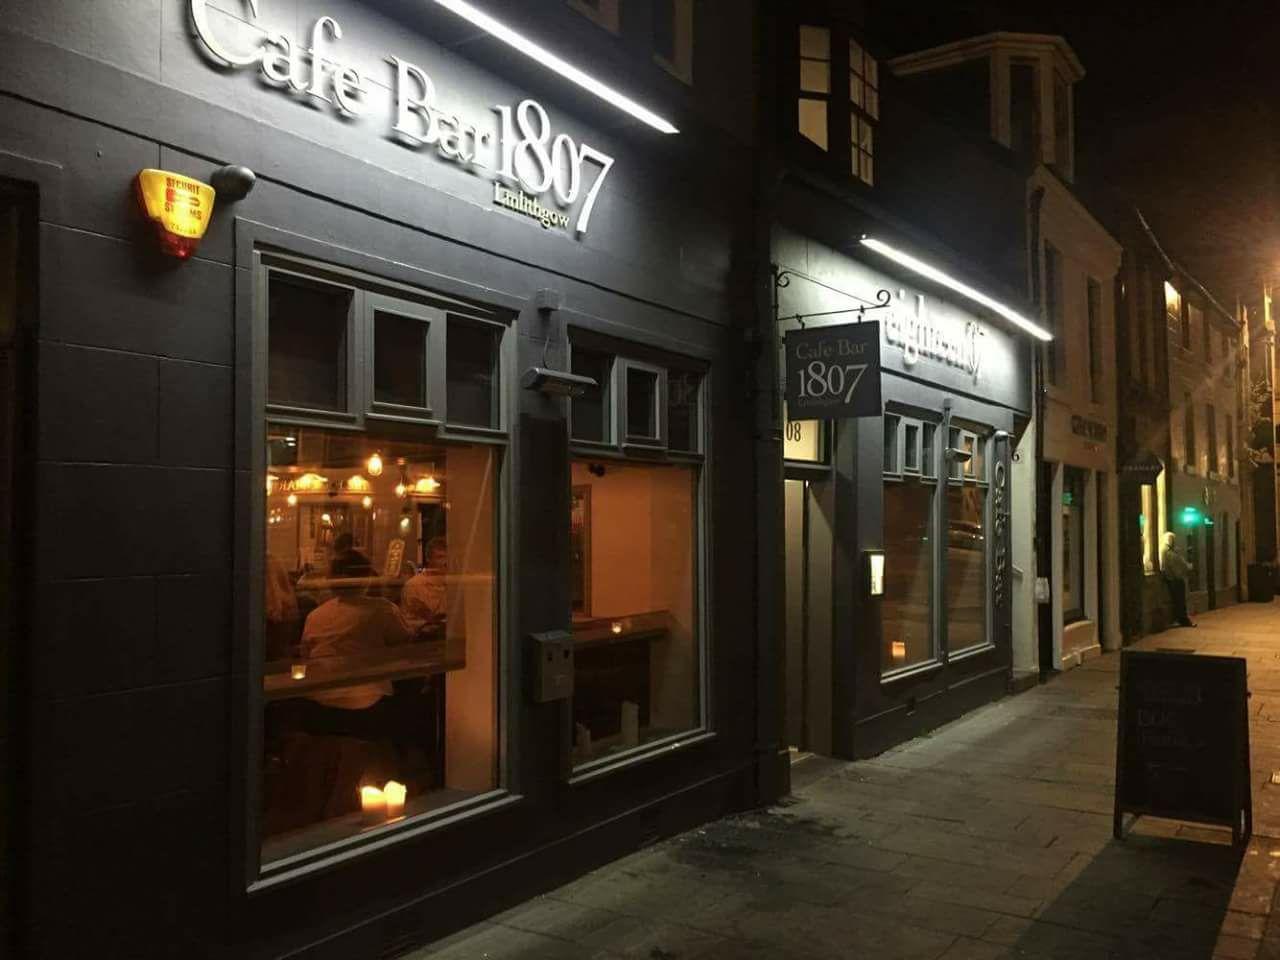 Cafebar 1807 Restaurant Bar In Linlithgow